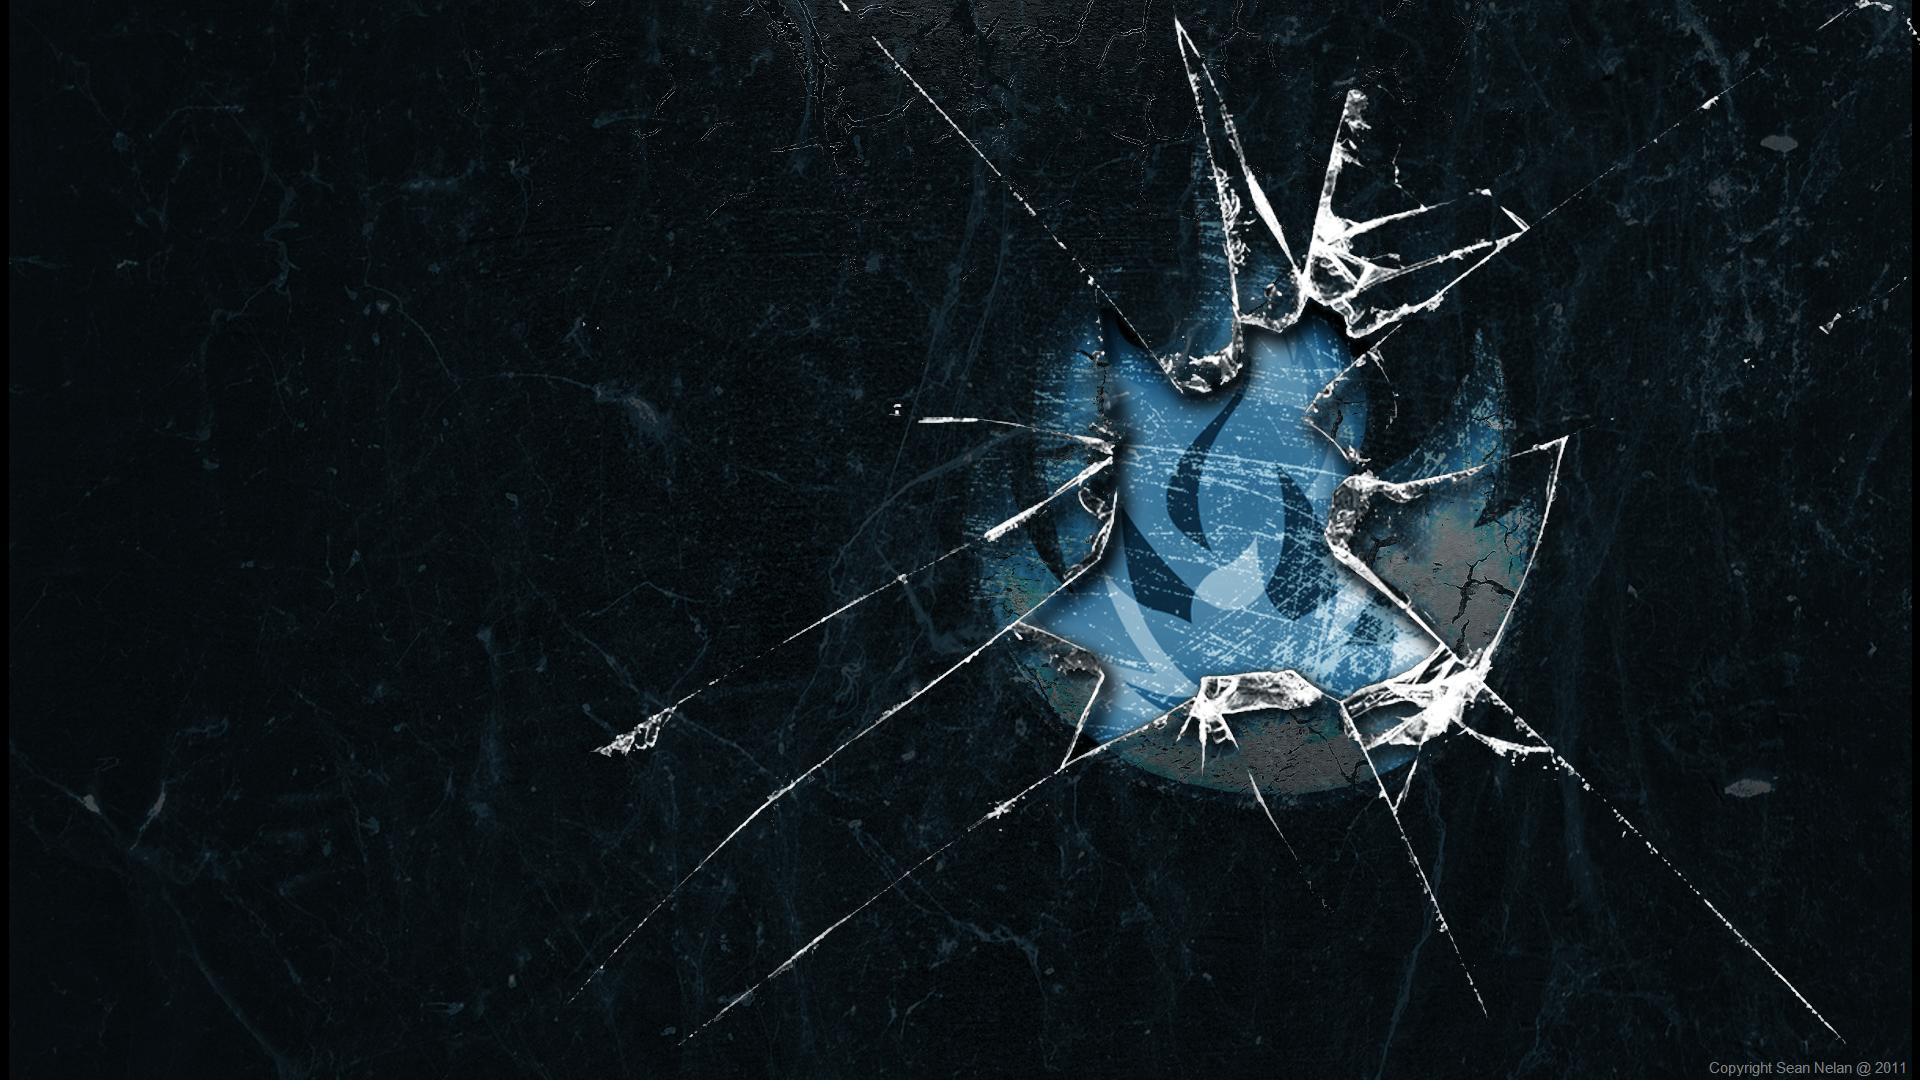 Download Broken Glass Wallpaper Widescreen pictures in high definition 1920x1080